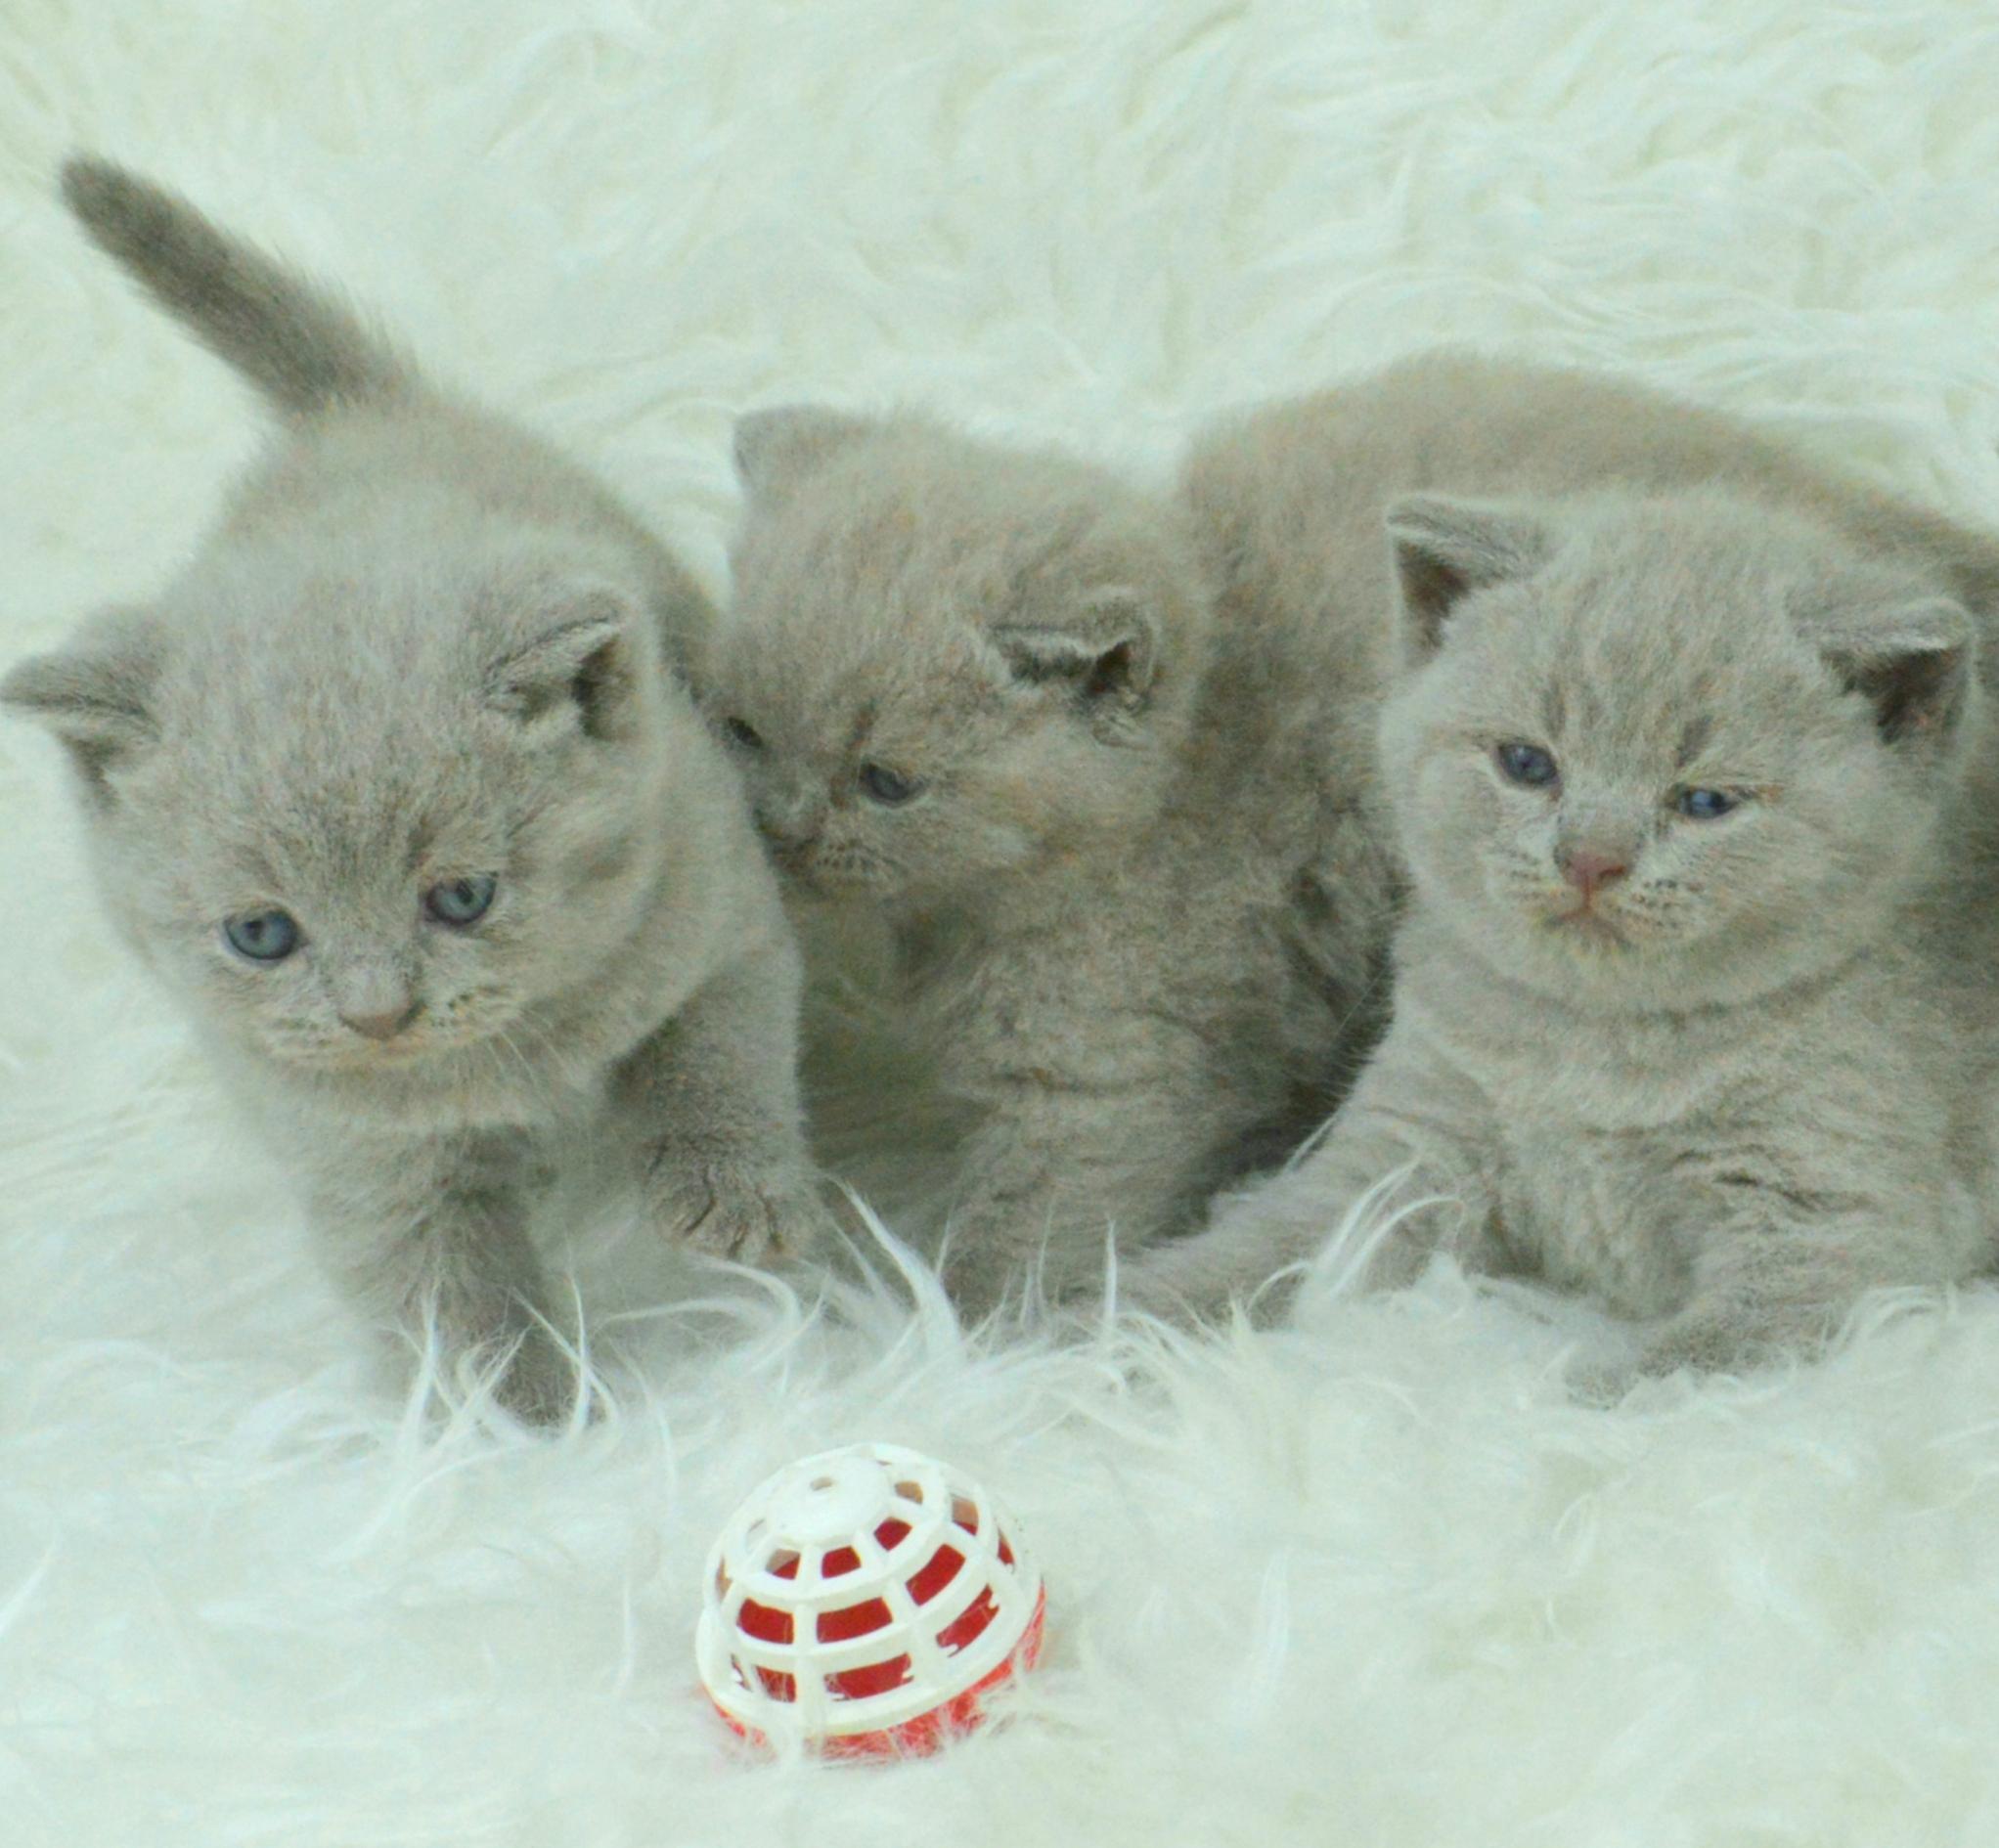 Sekilas Tentang Warna Bulu Kucing British Shorthair Buitenzorg Cattery